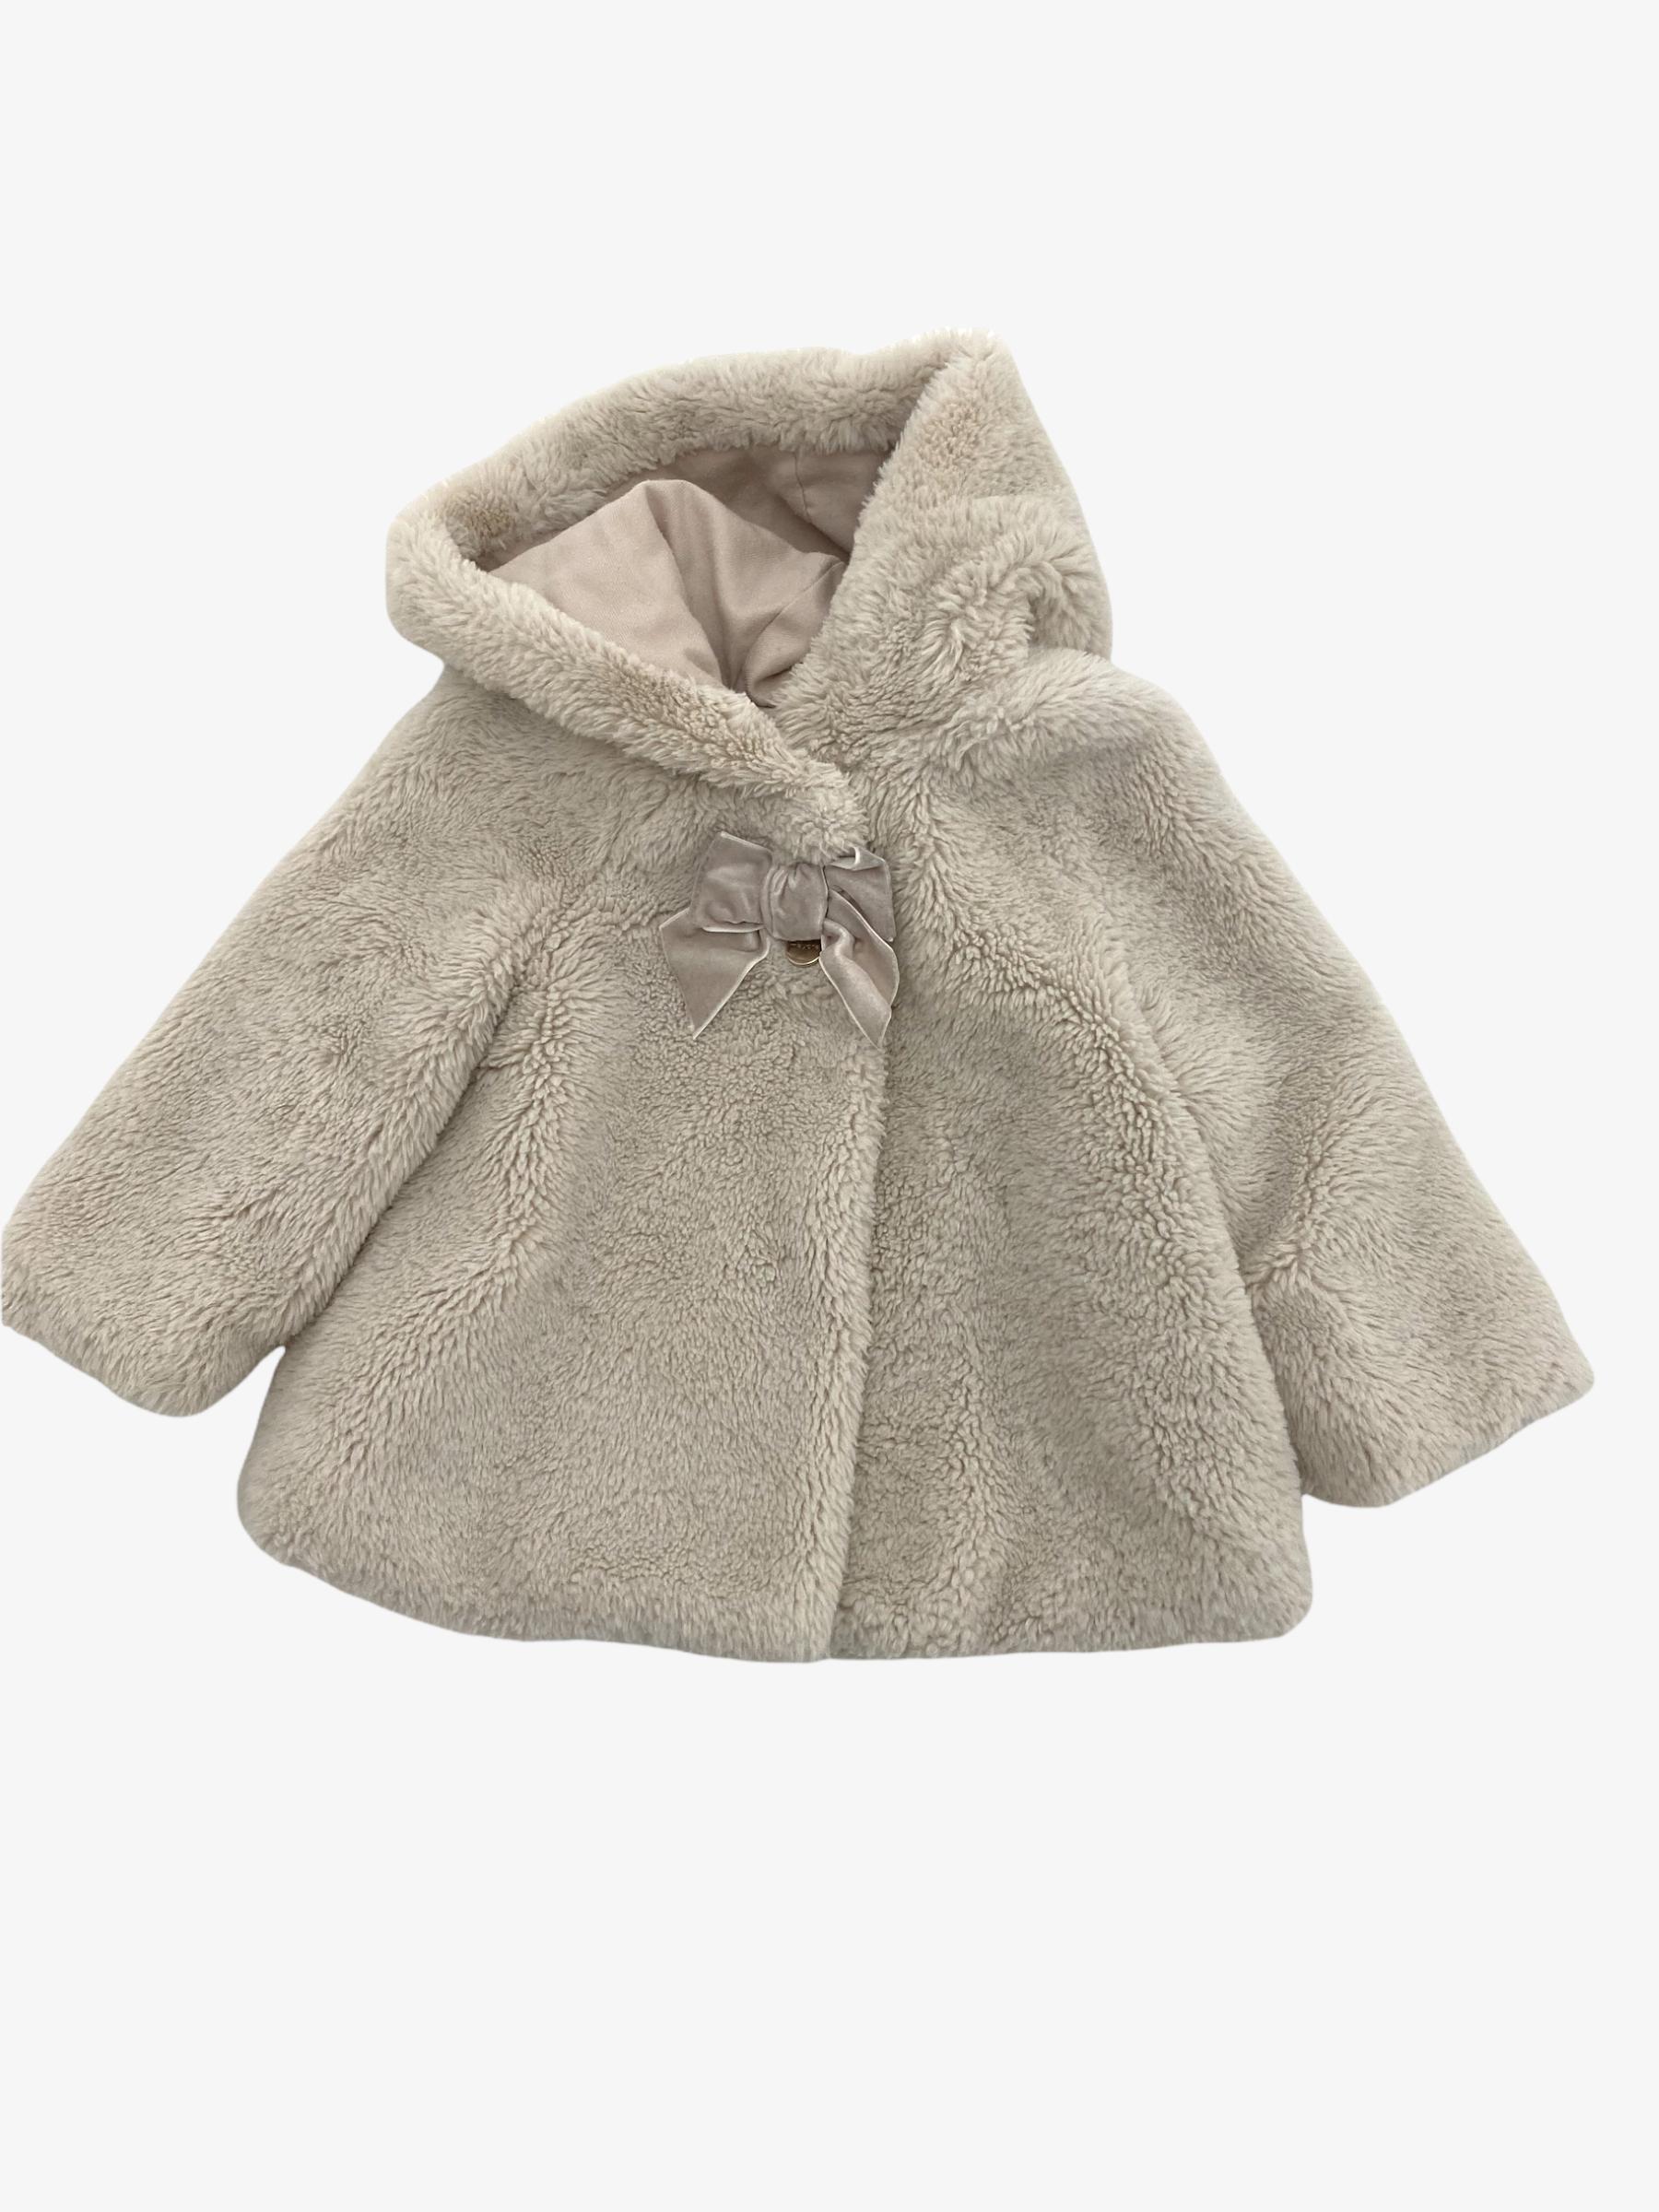 Teddy coat • Tweedehands jas van merk Mayoral in maat 80